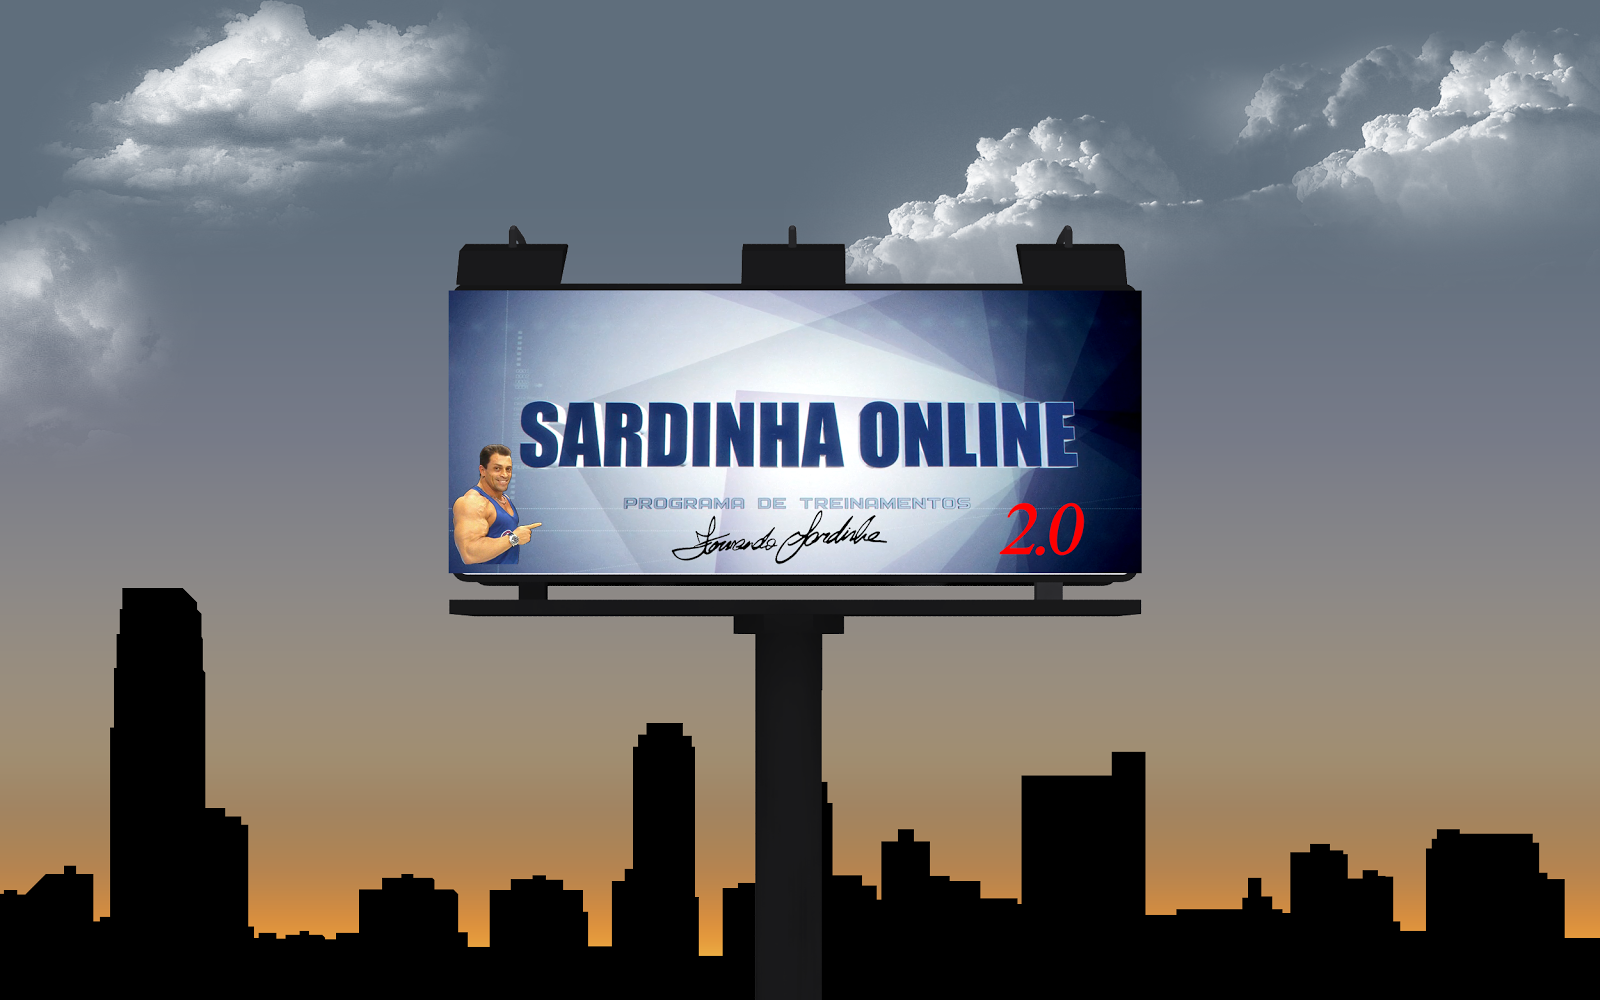 MÉTODO SARDINHA 2.0